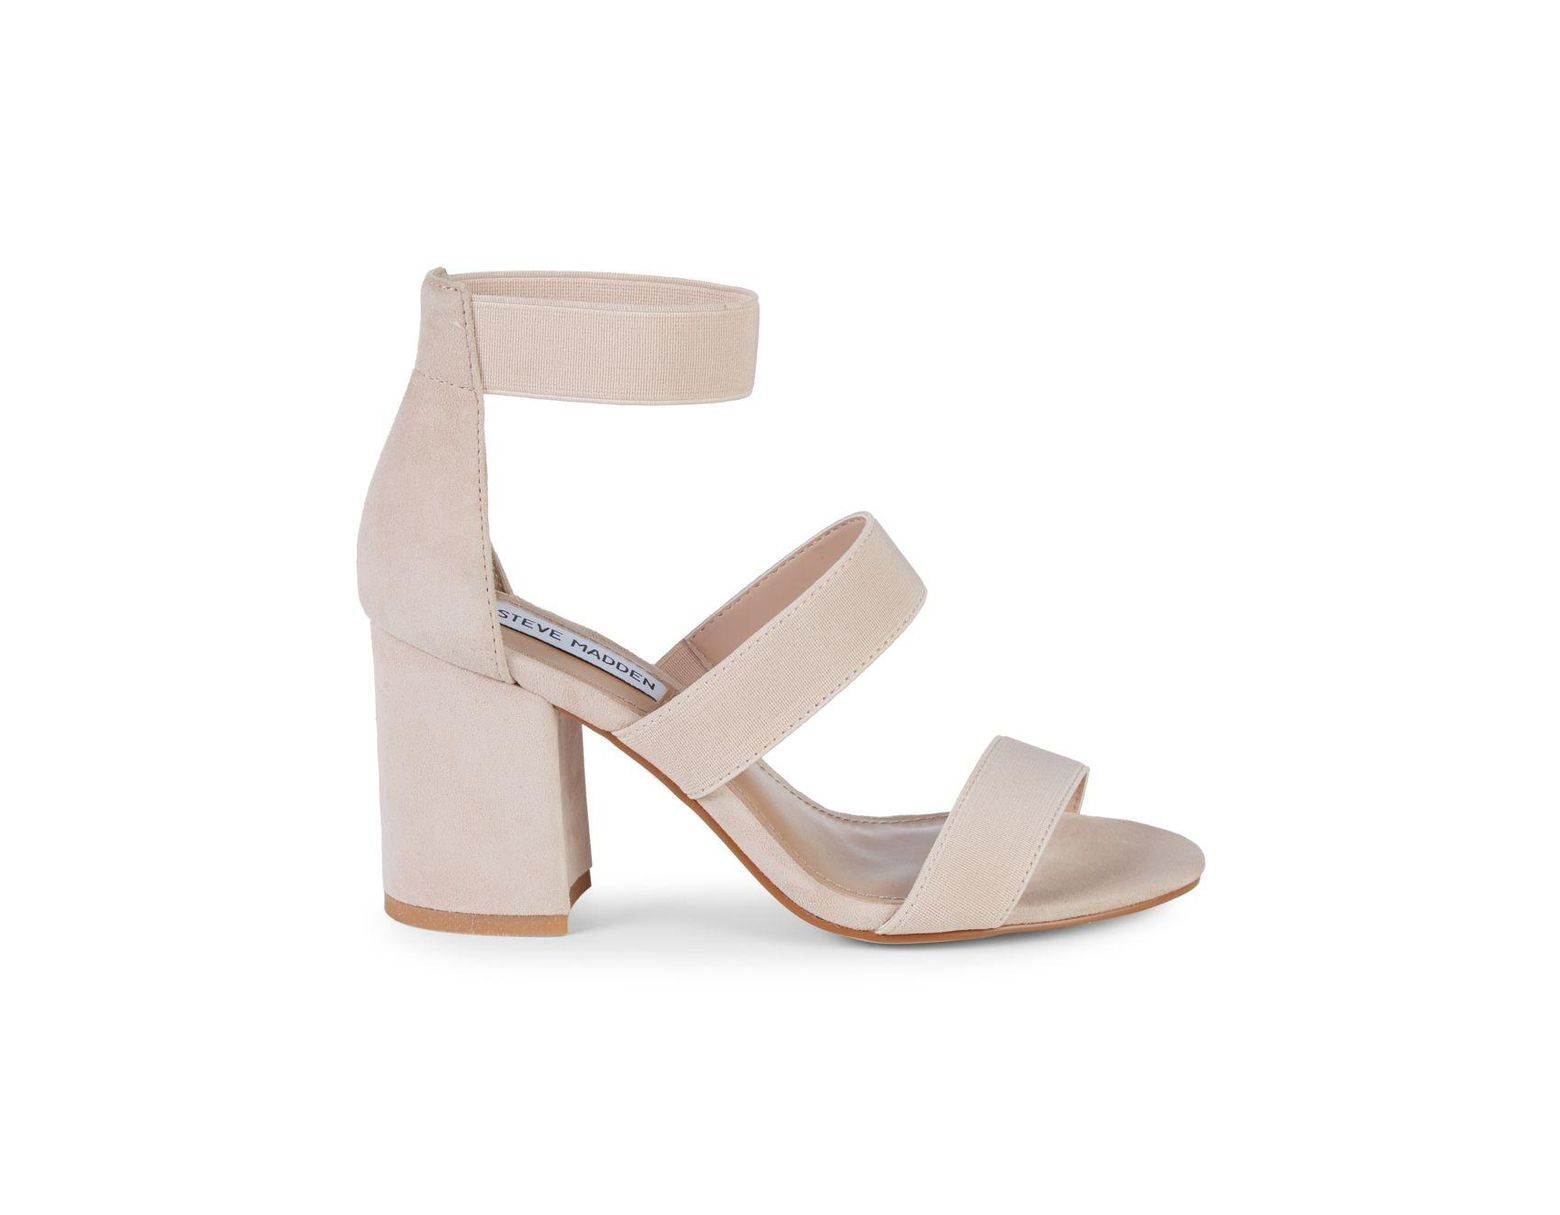 a47b7c65daf Women's Leara Triple-strap Sandals